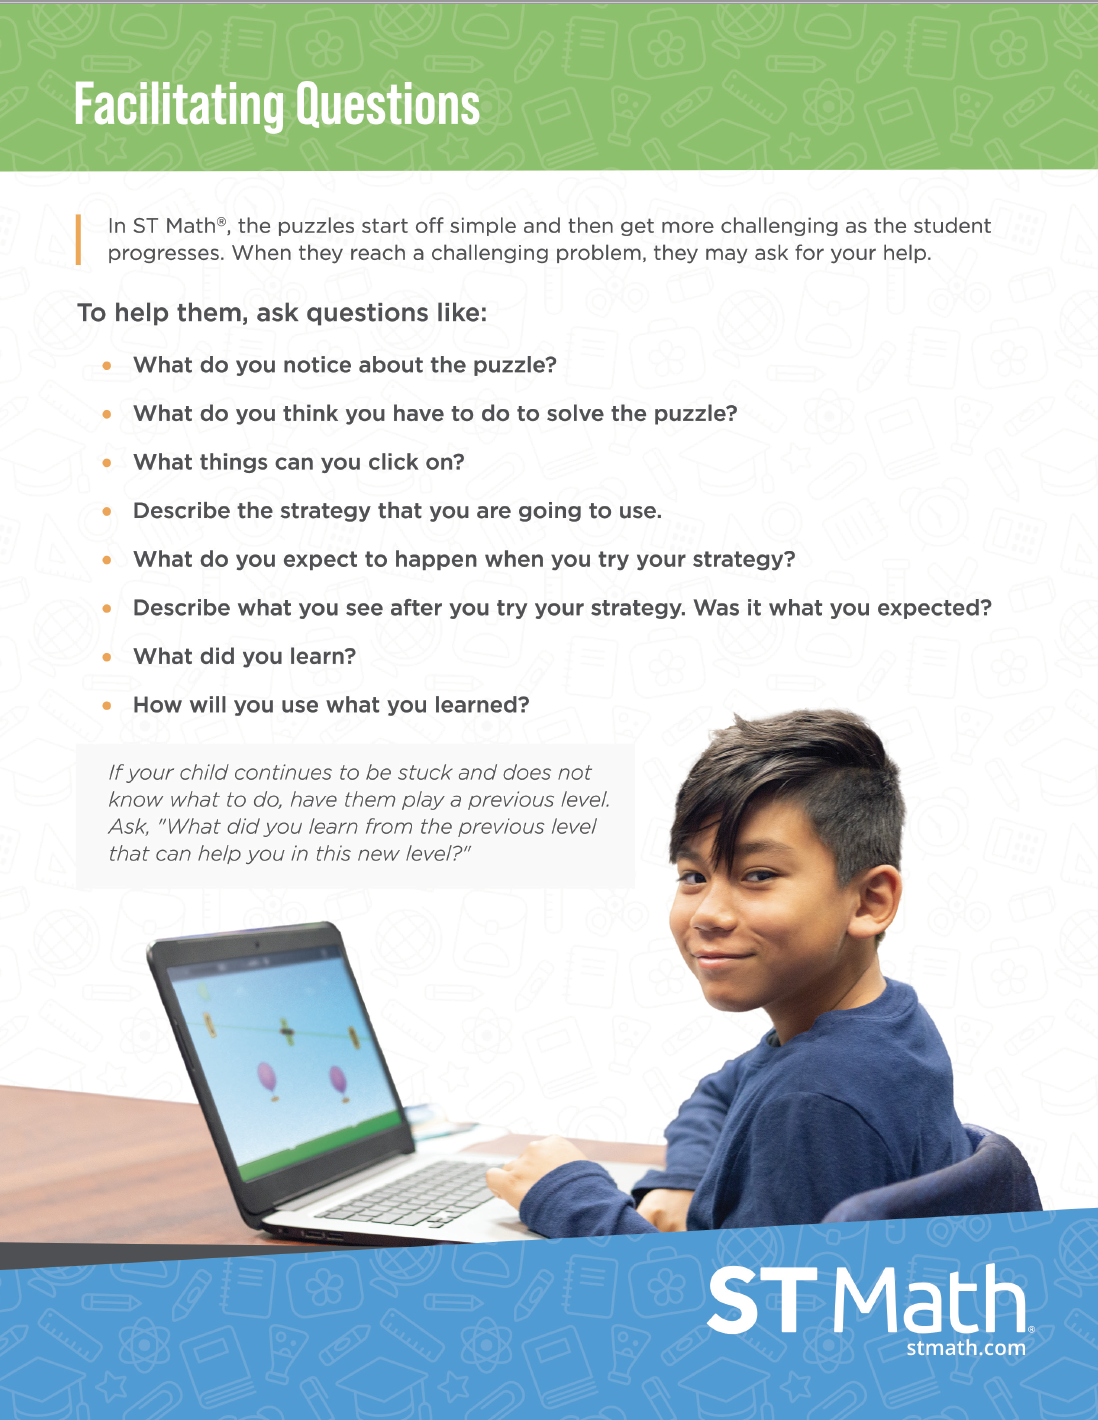 Facilitating Questions Poster ST Math